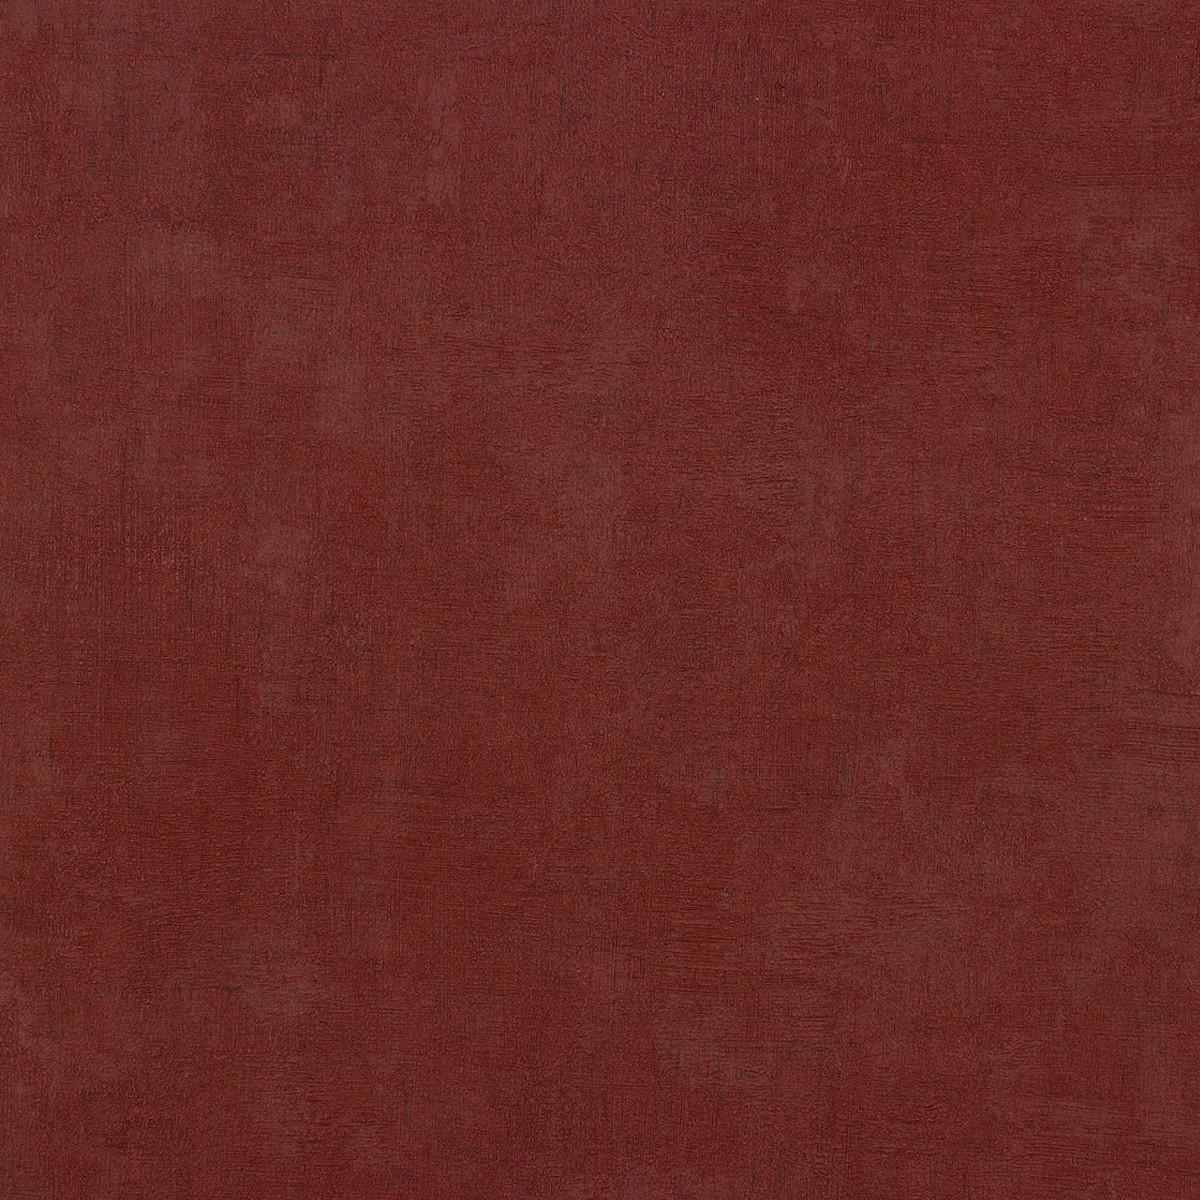 Daniel Hechter Tapete Lila : Tapete Vliestapete Uni Wei? Taupe 6808 37 Meliert Silber Glitzer